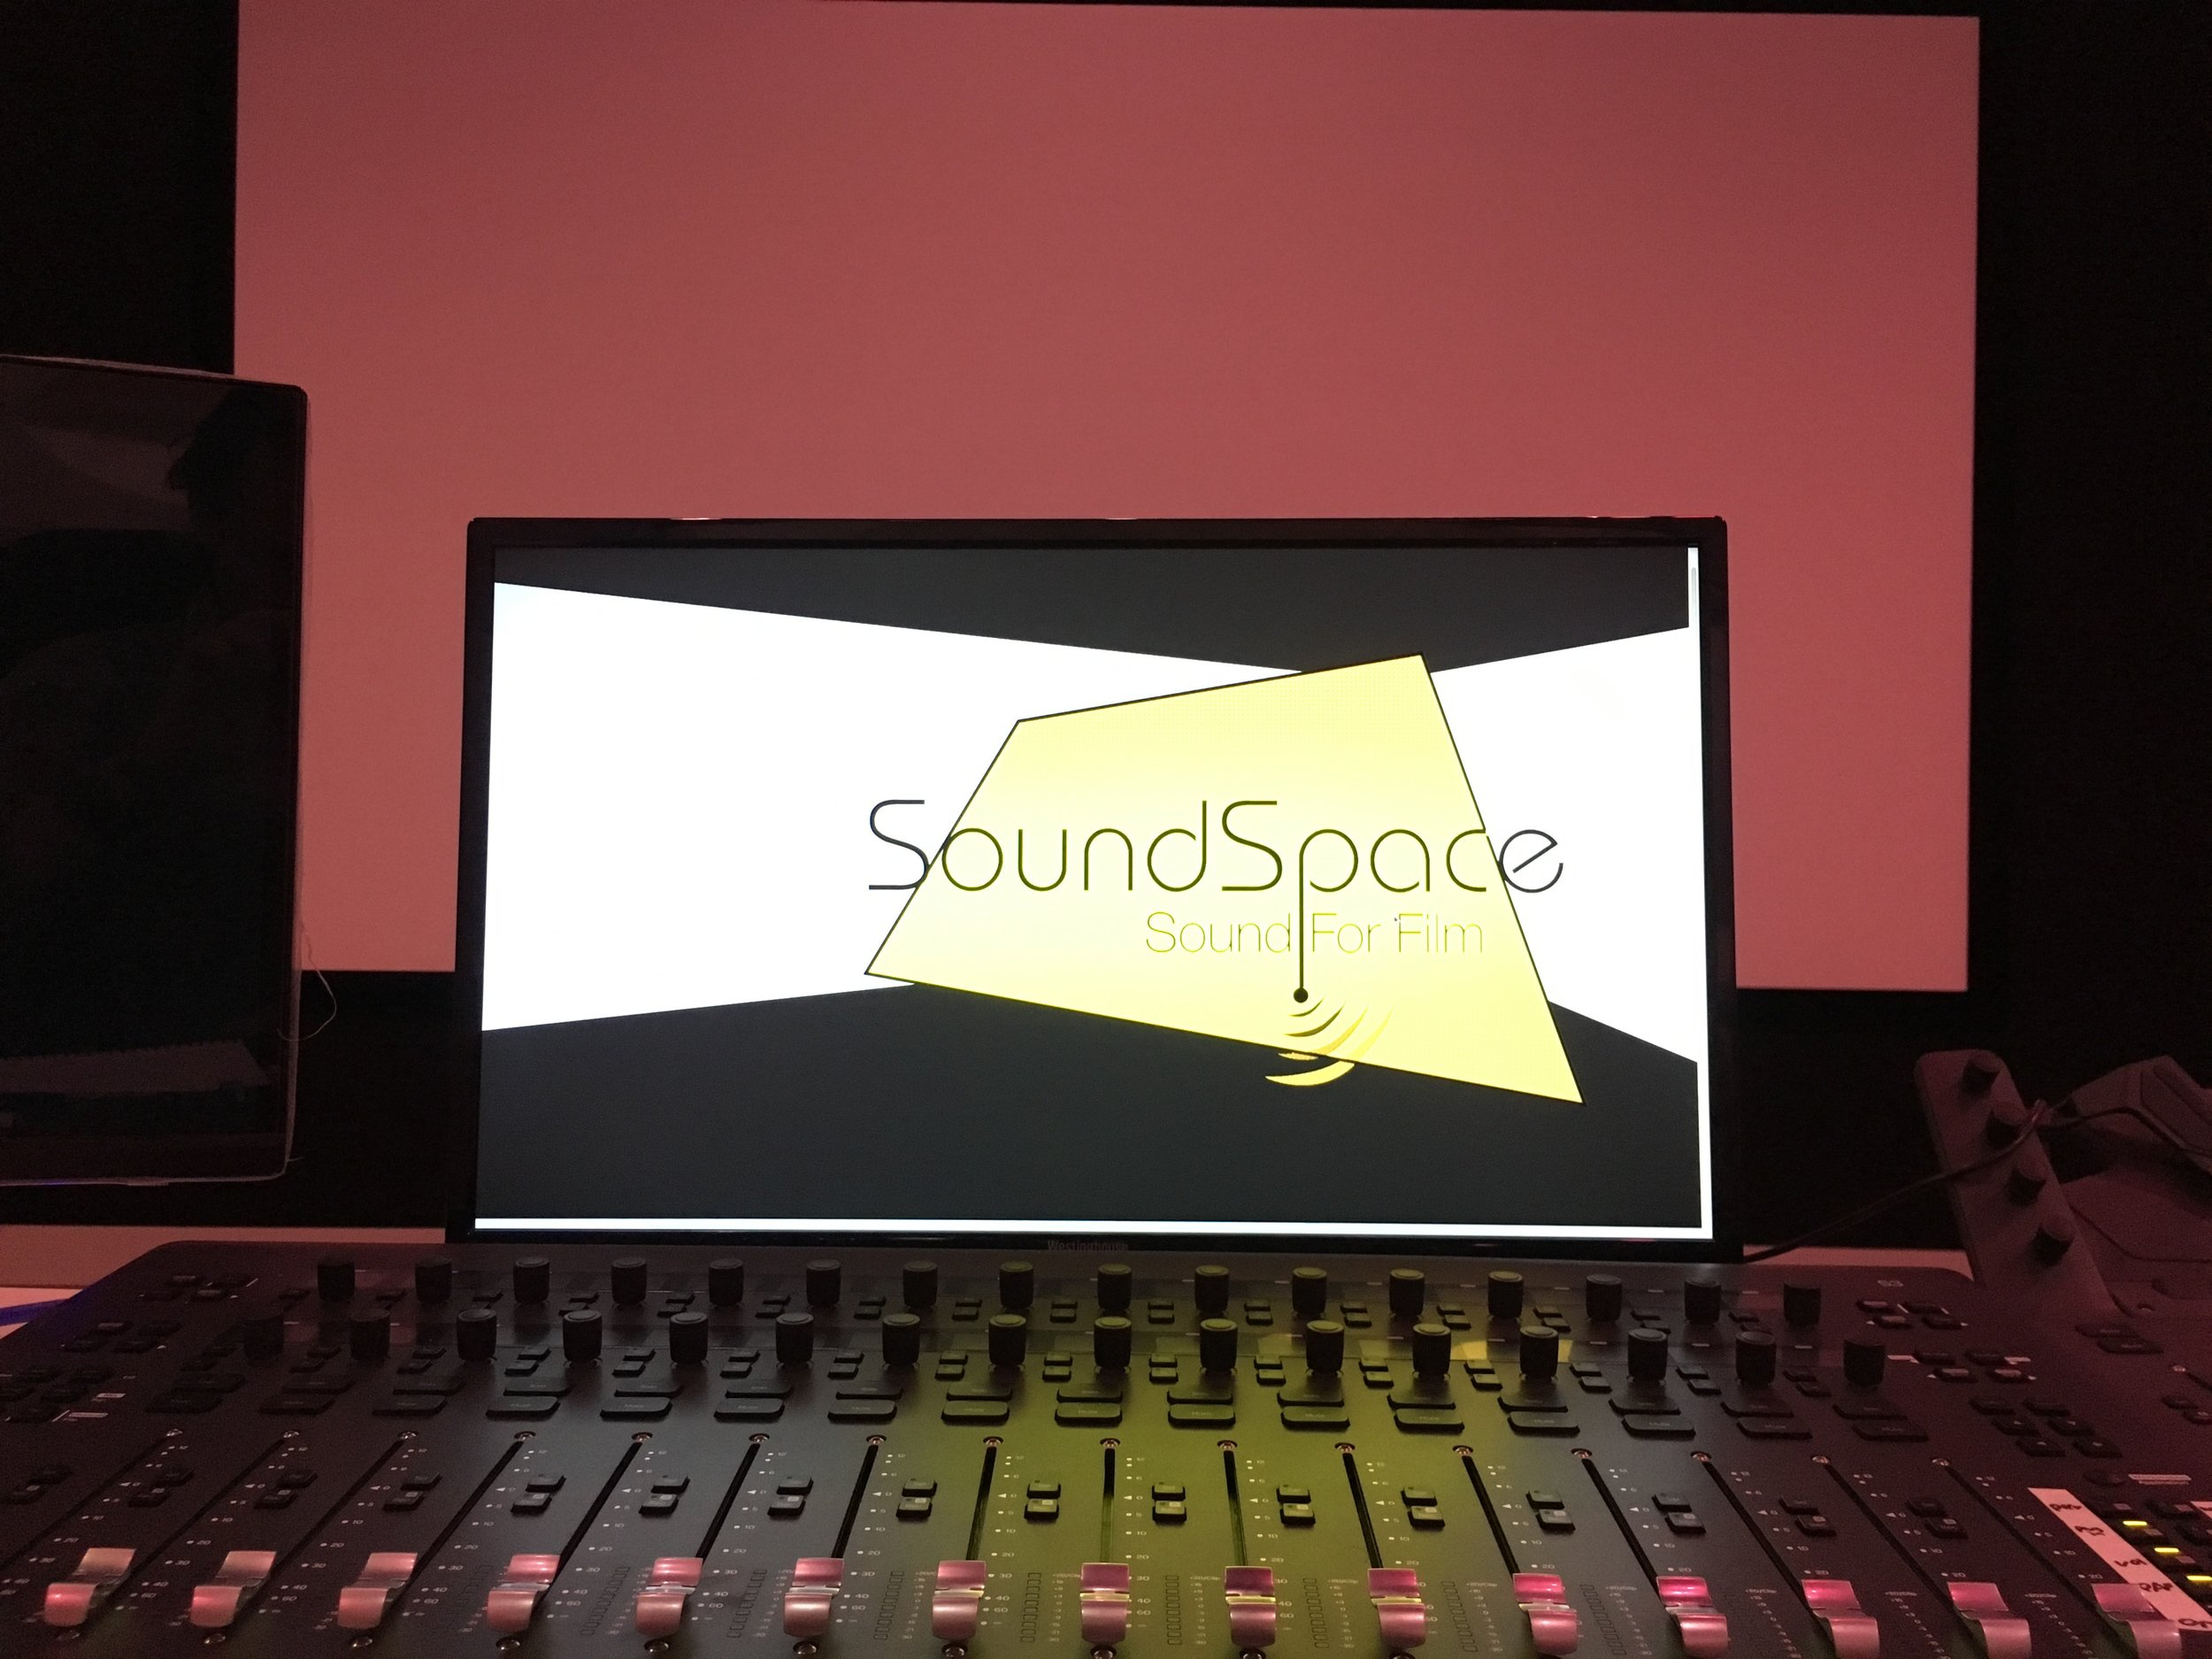 SoundSpaceCO-Board.JPG